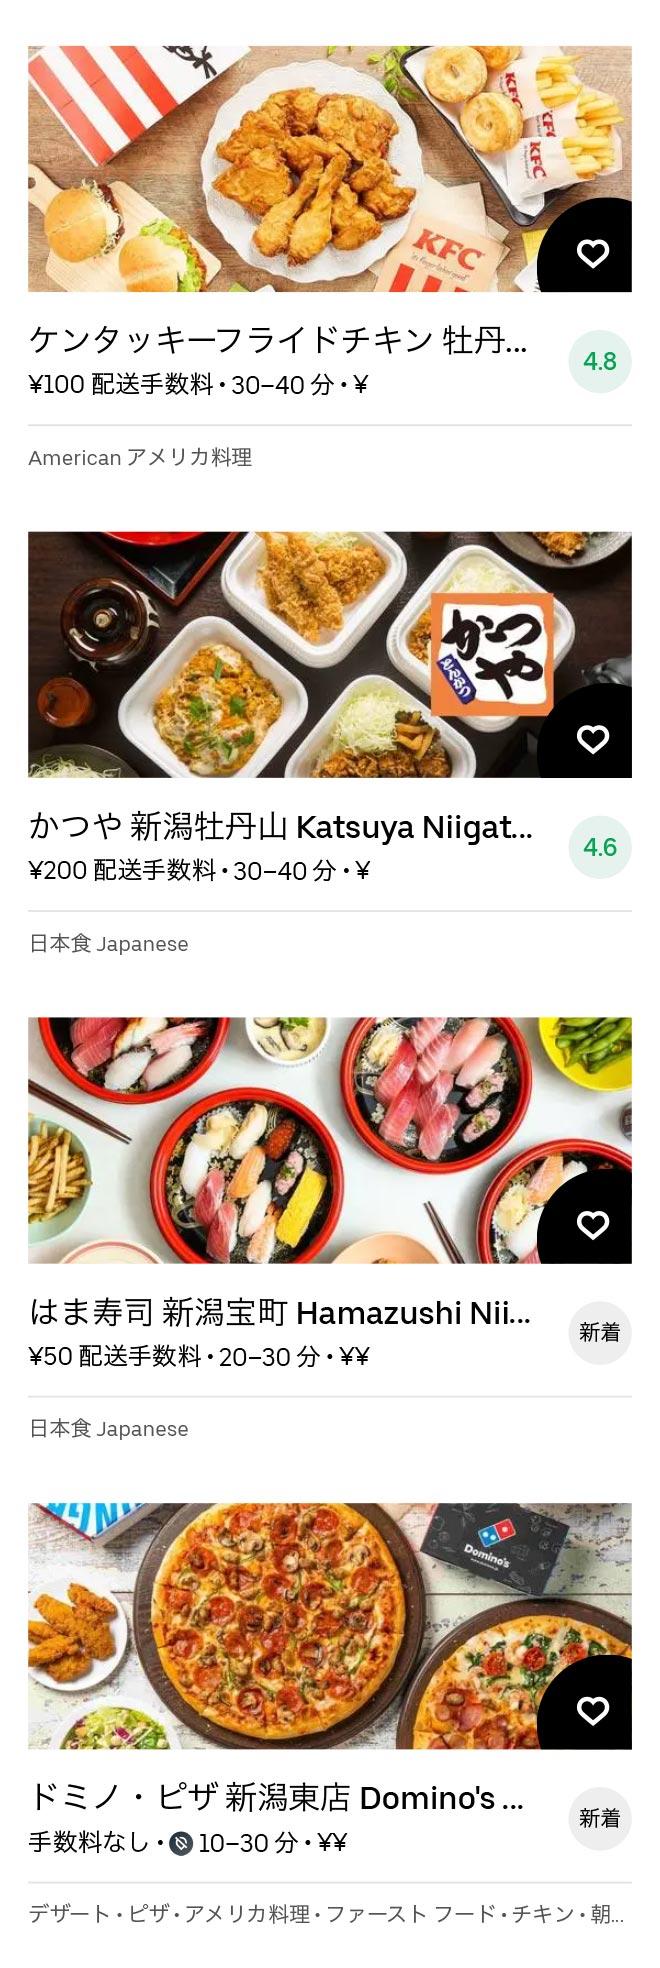 Koganemachi menu 2011 06